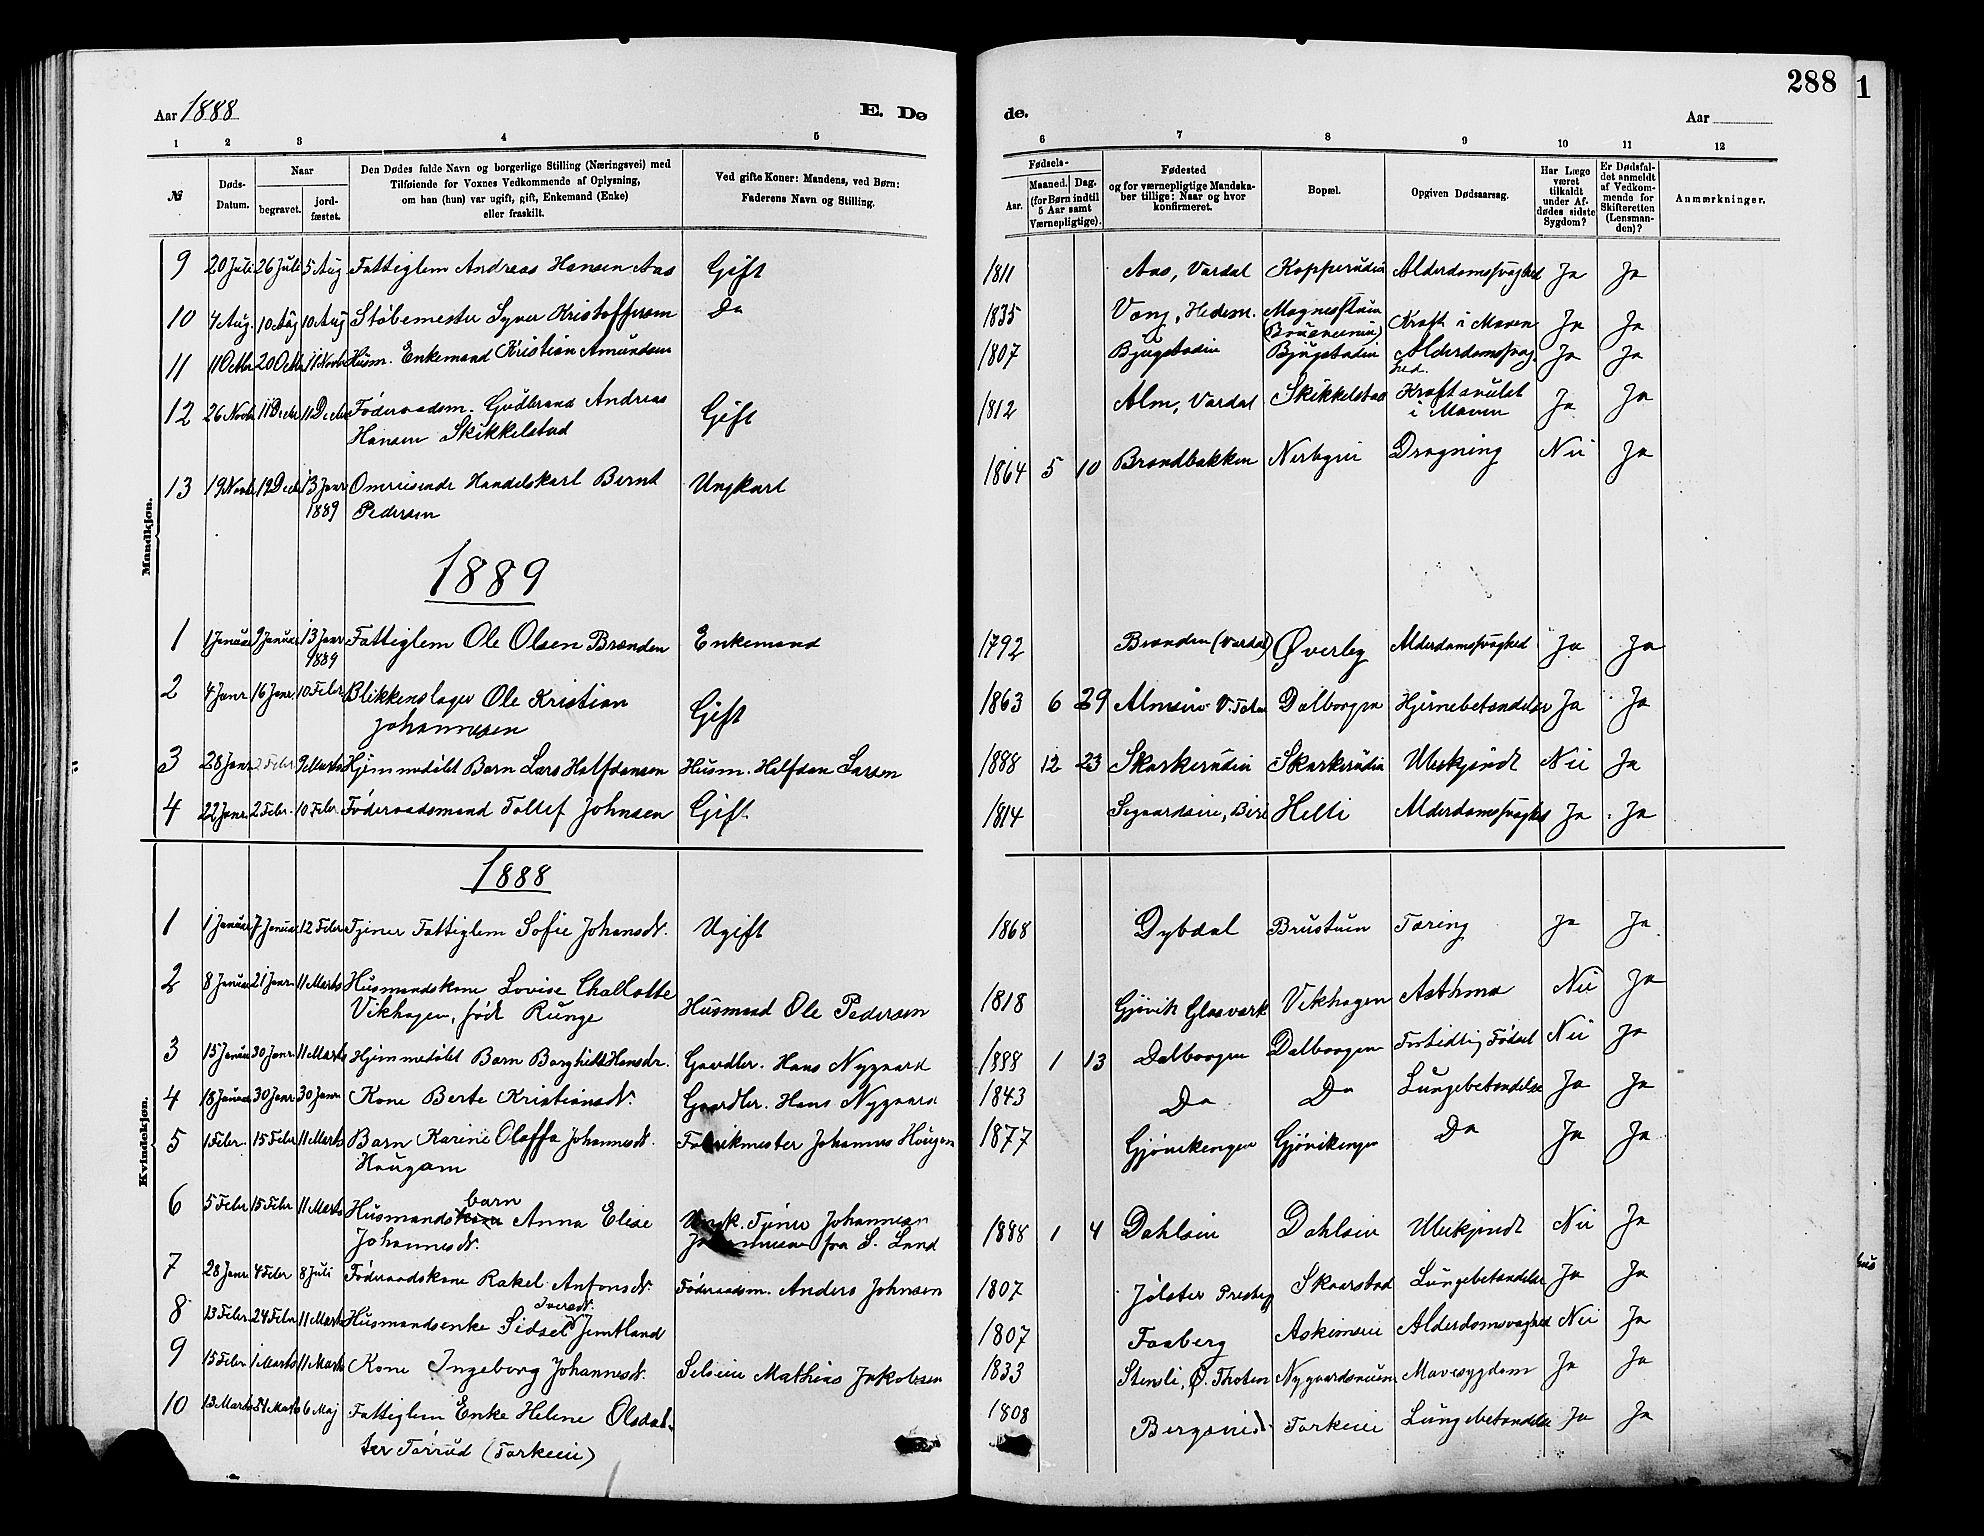 SAH, Vardal prestekontor, H/Ha/Hab/L0007: Klokkerbok nr. 7 /1, 1881-1895, s. 288